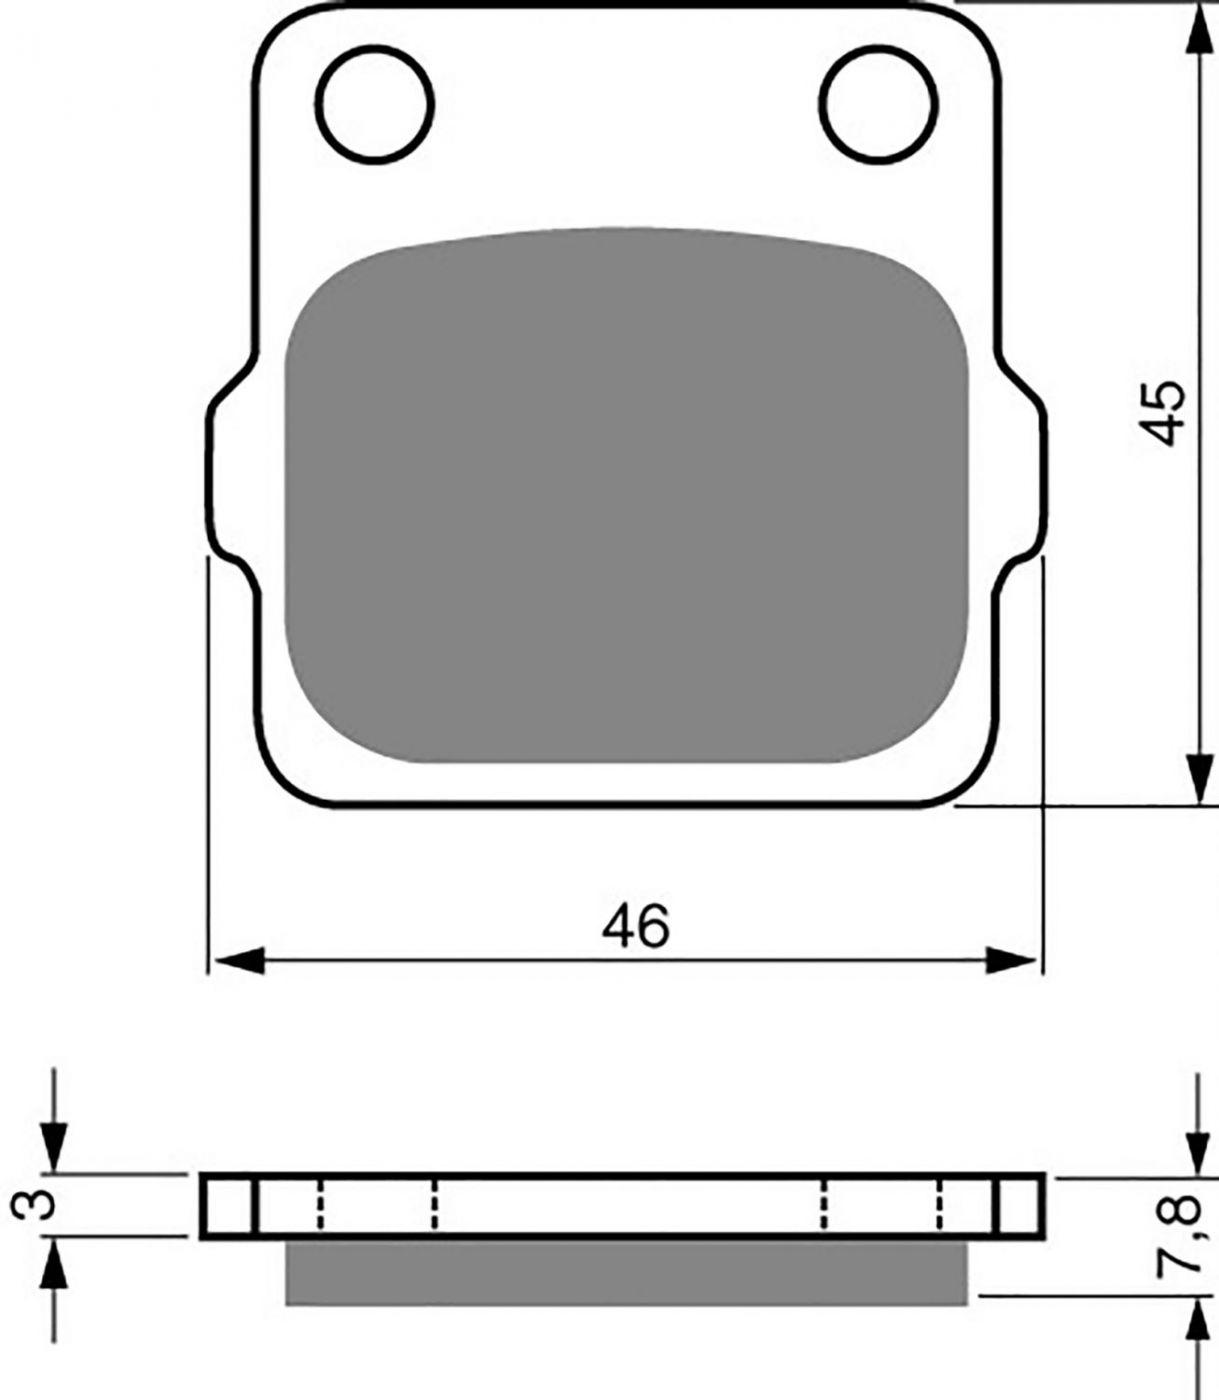 Goldfren K1 Pads (Sand & Mud) - 700007GO image